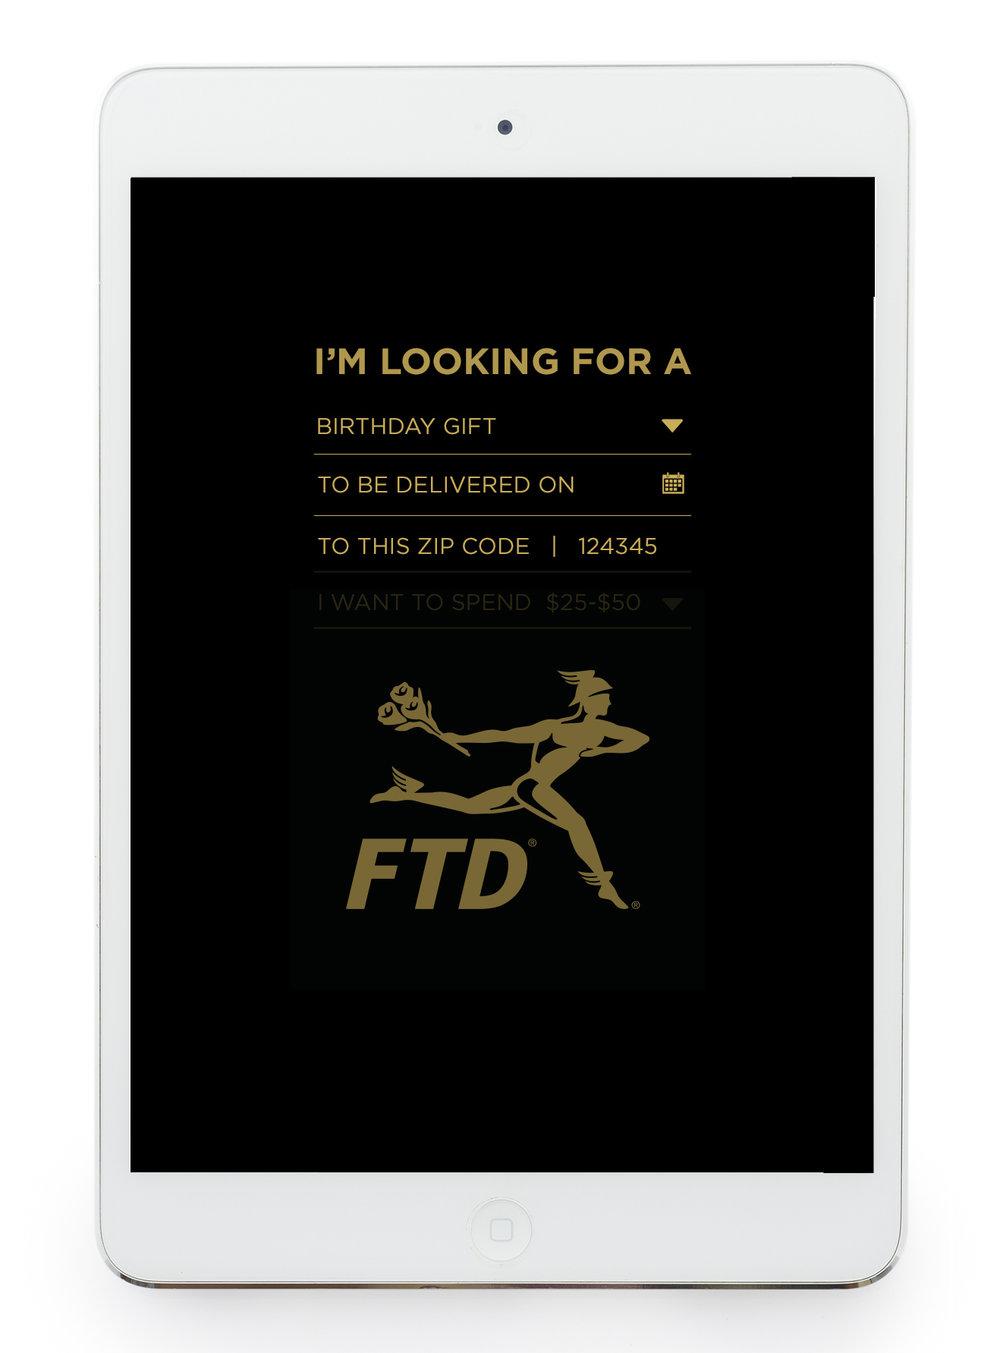 FTD_Flo_Dir_Inteface_03B.jpg